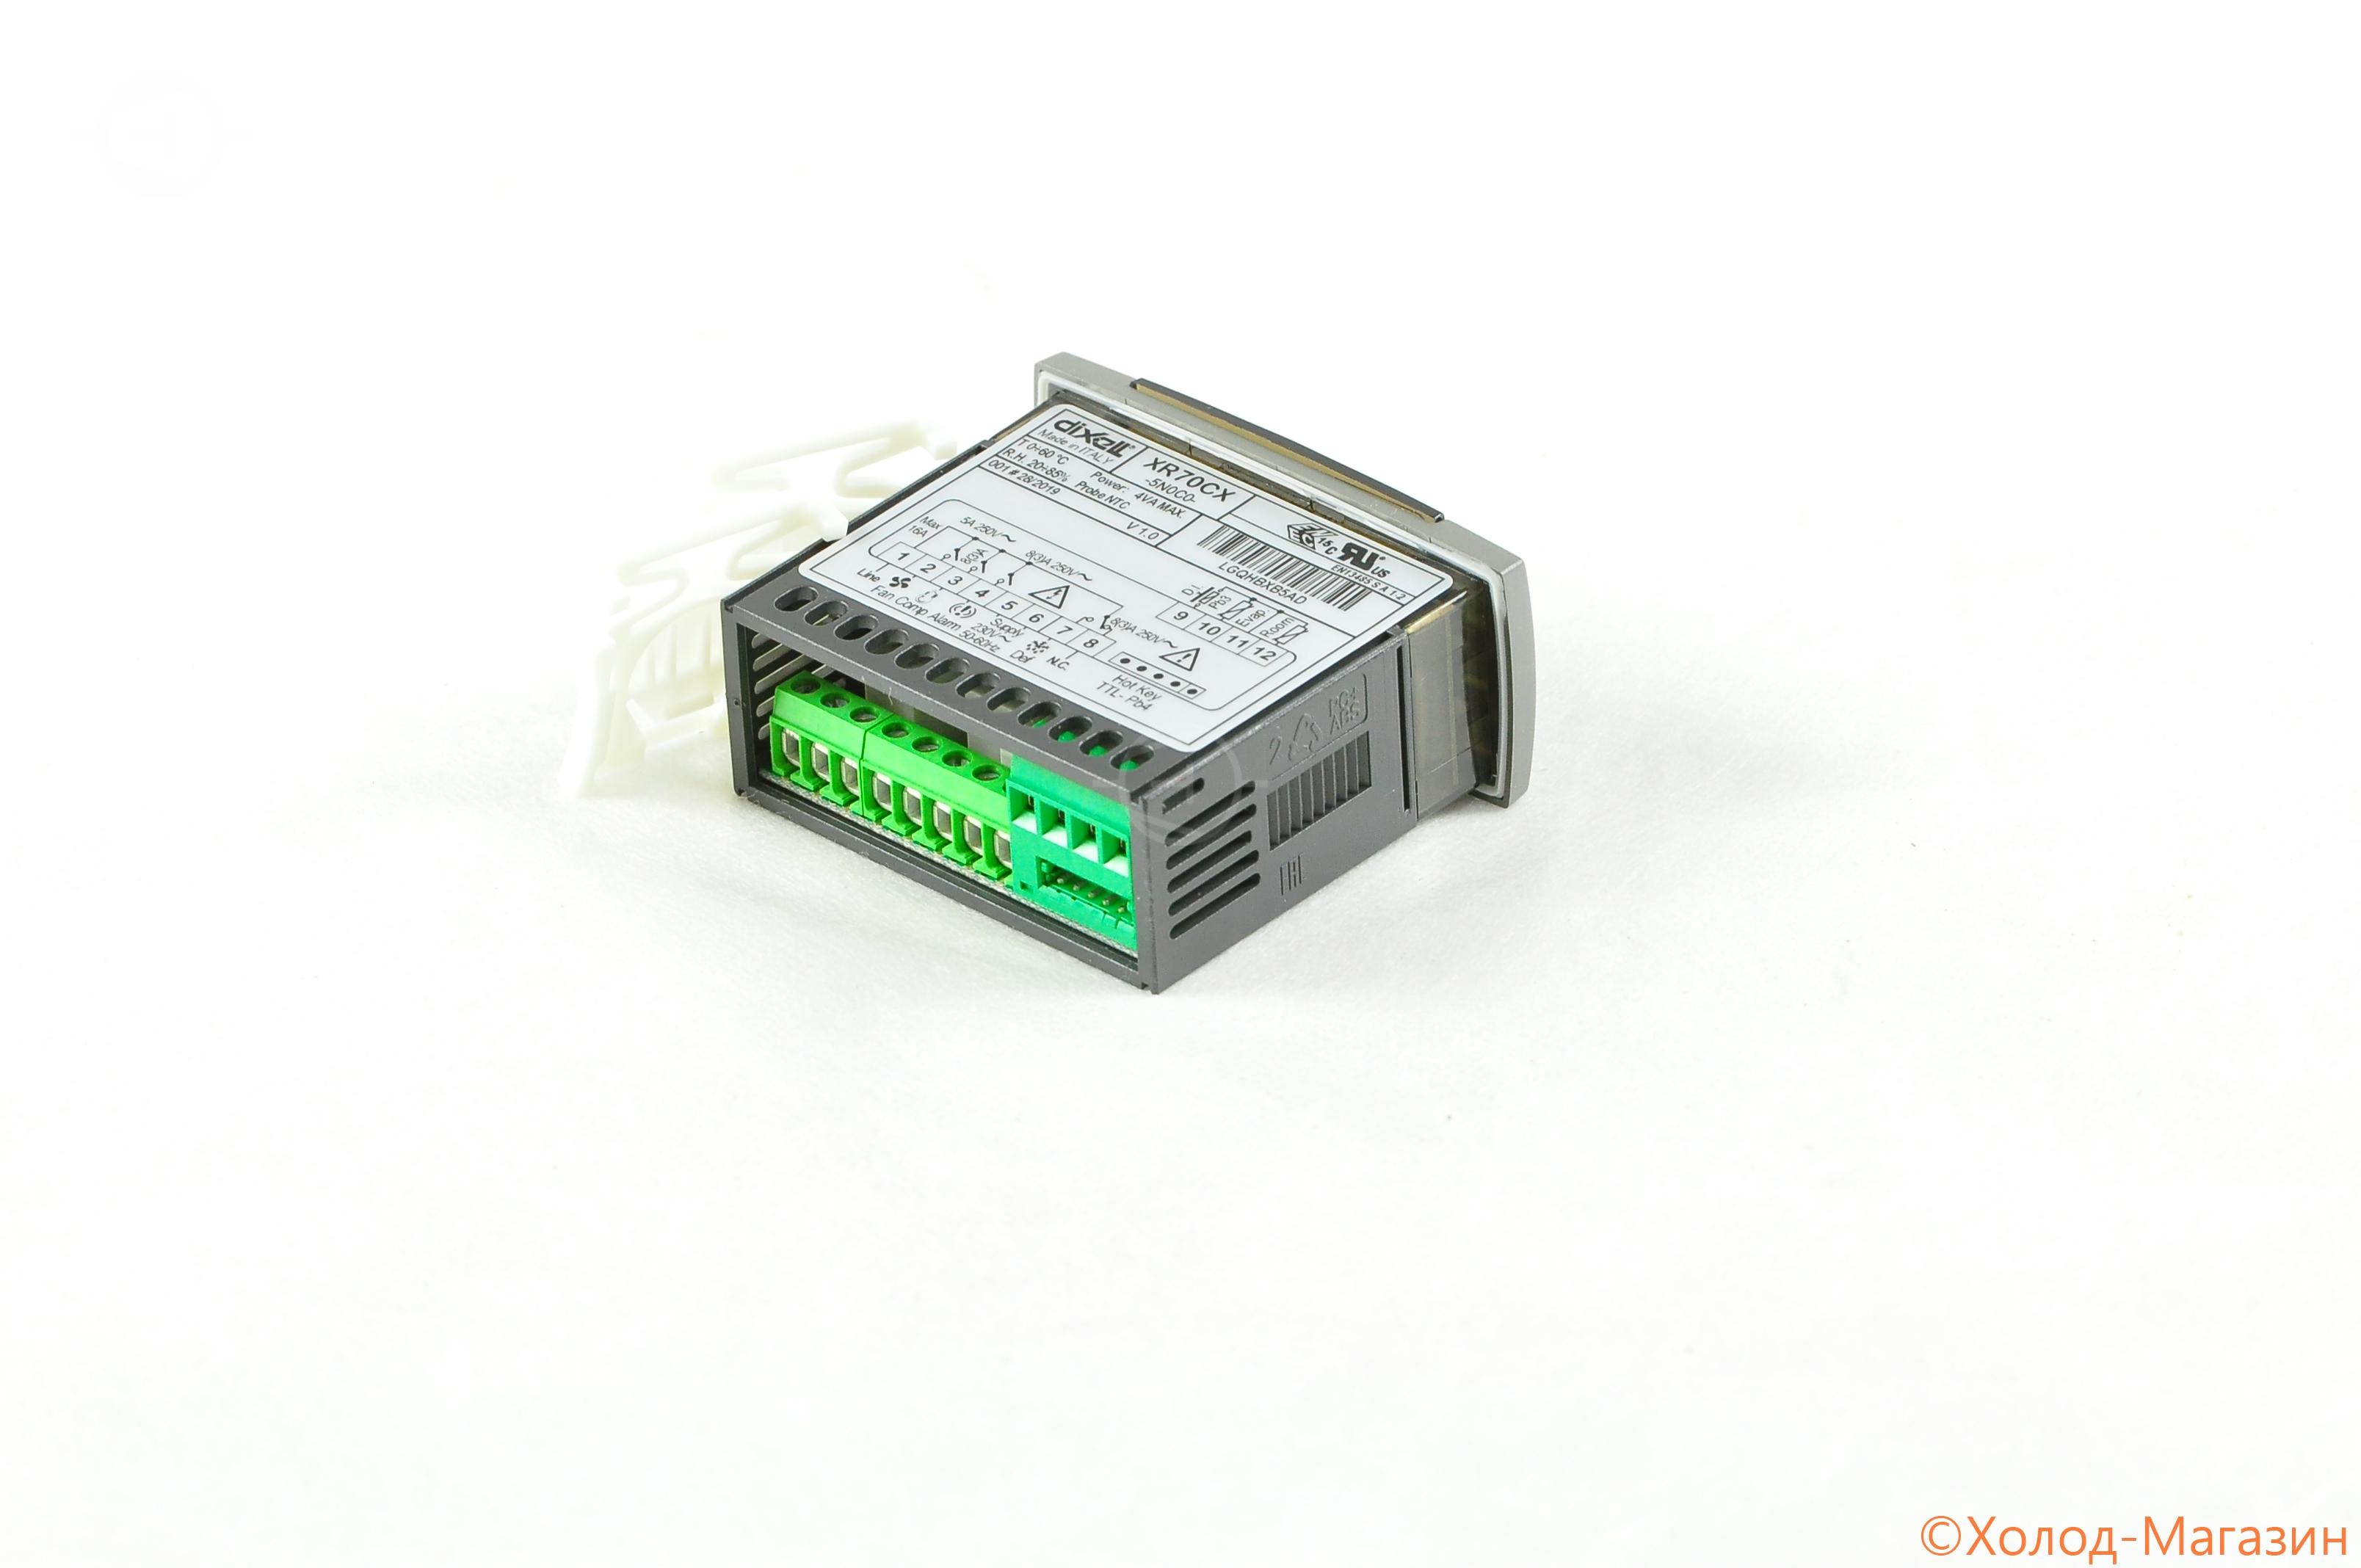 Контроллер Dixell XR70CX -5N0C0 NTC 3R=8A+5A zona NE. 230V